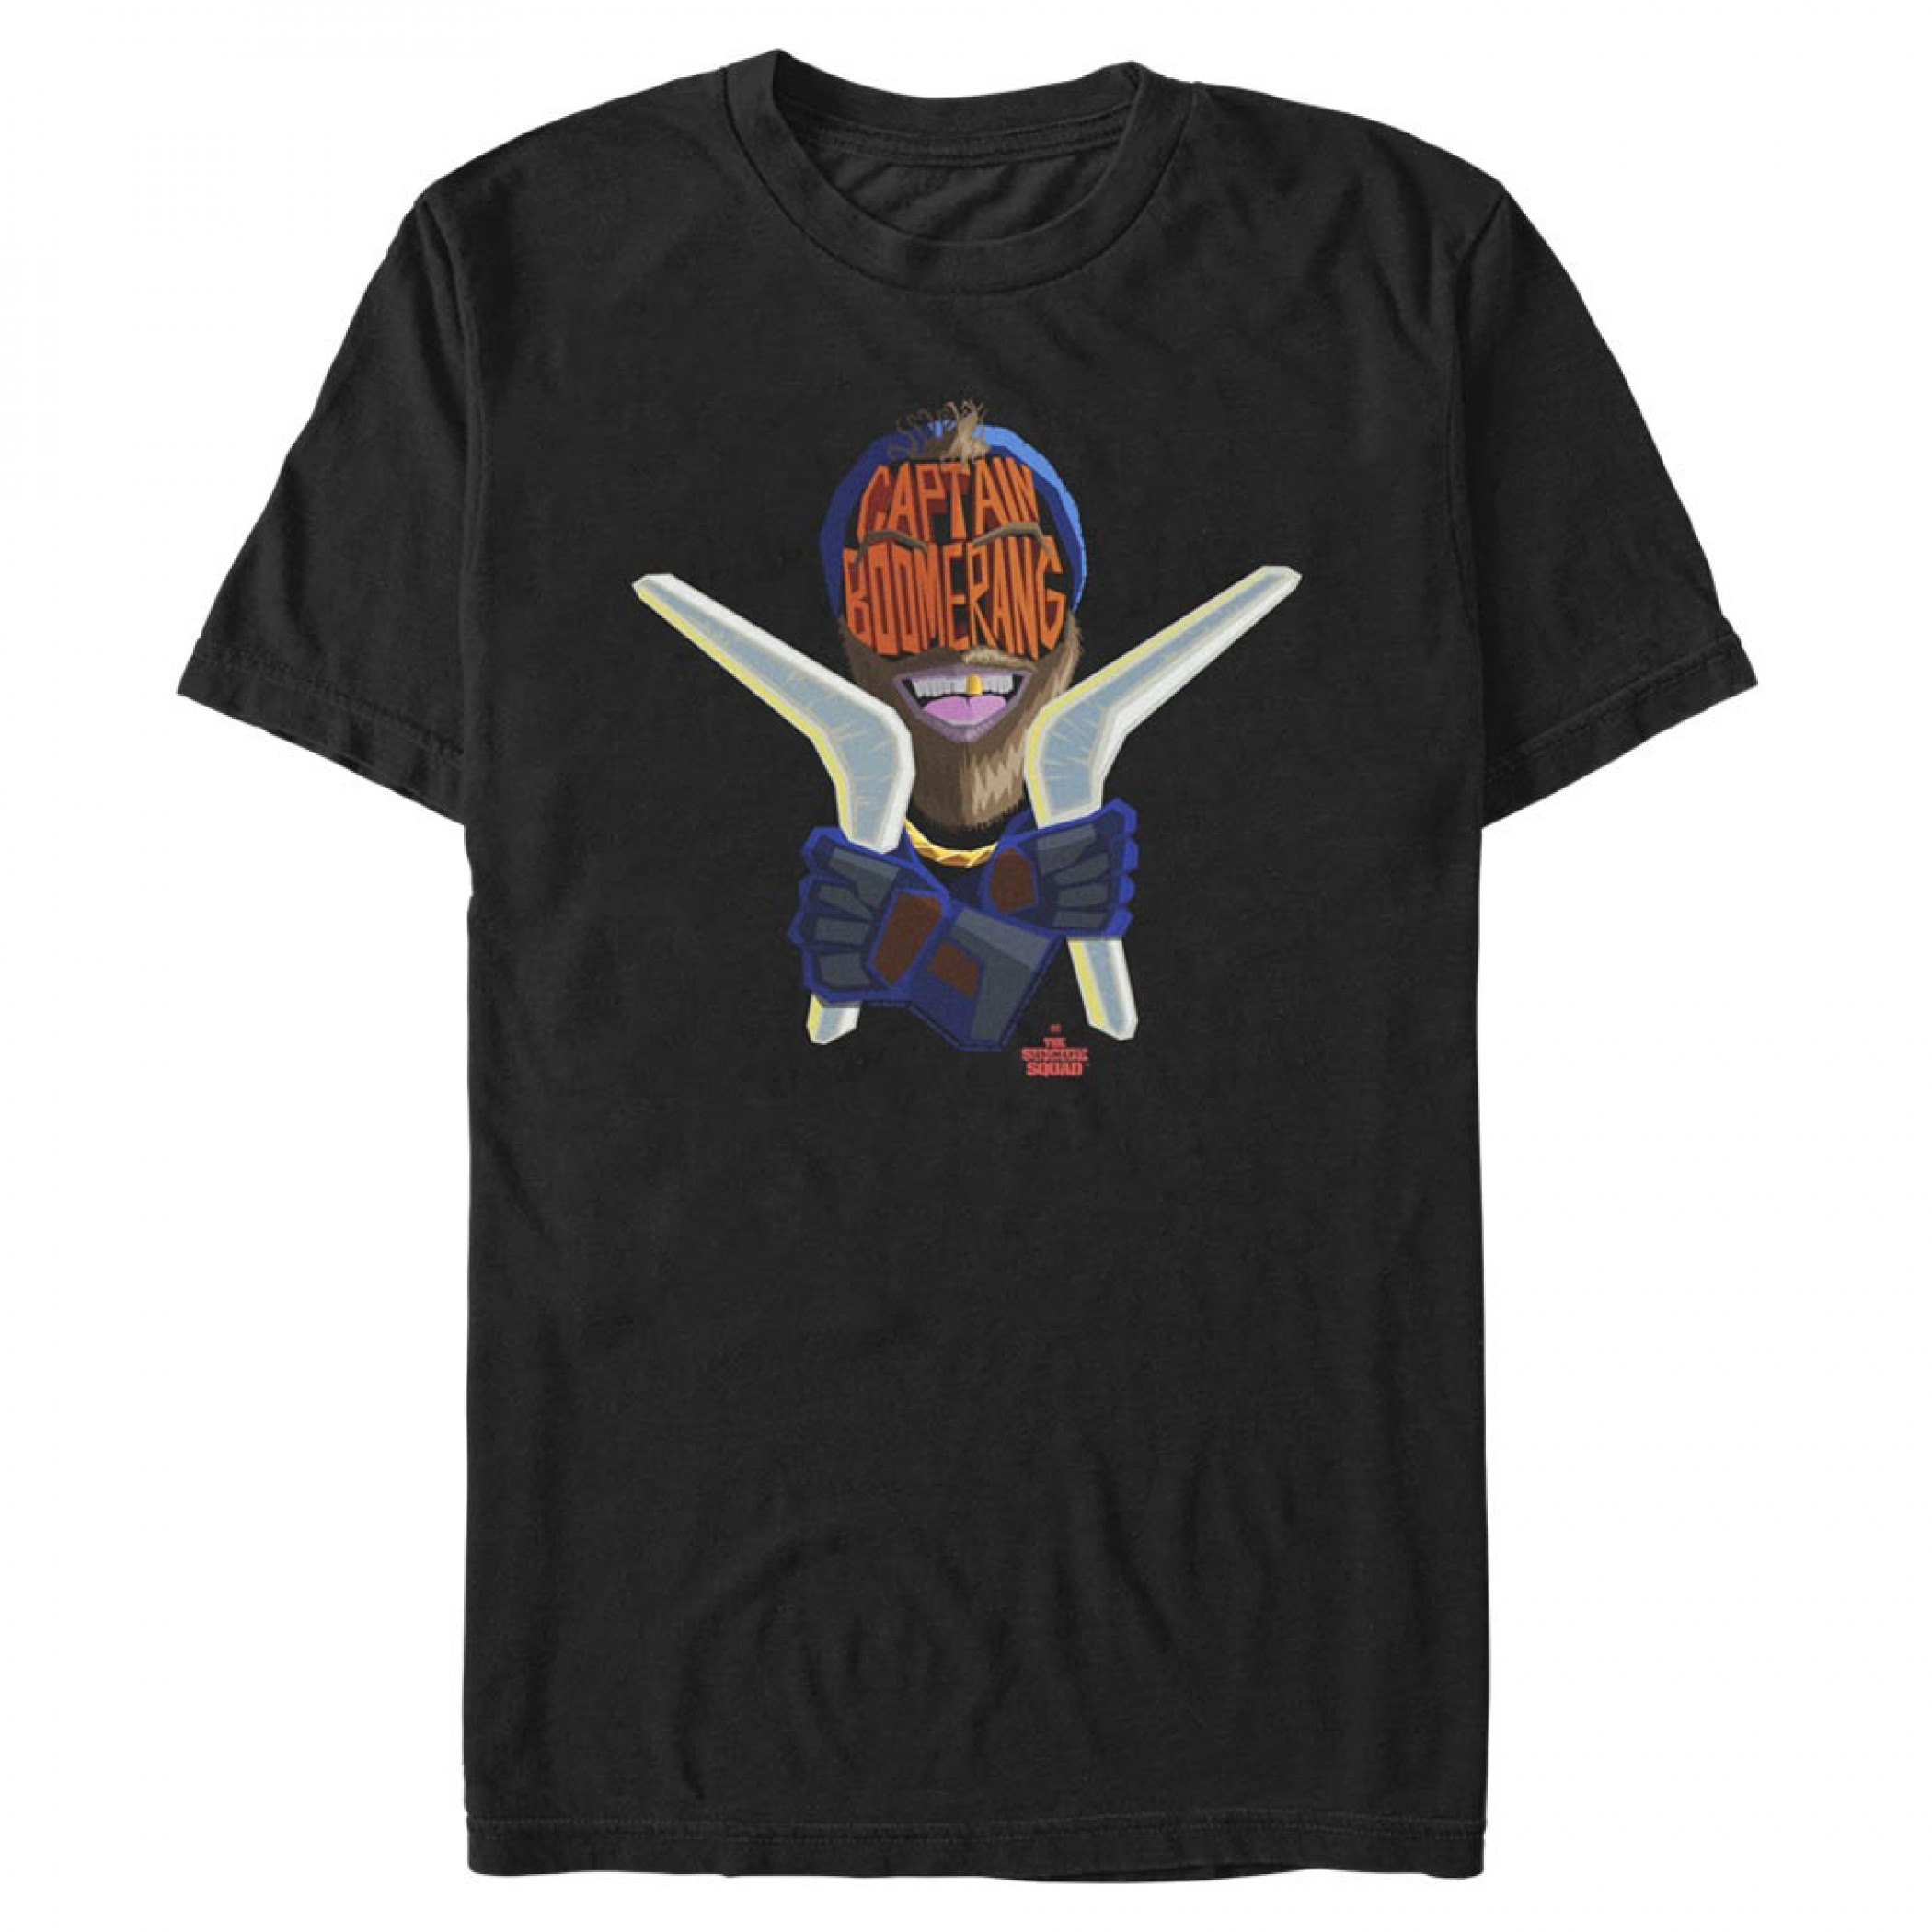 The Suicide Squad Captain Boomerang Stylized Men's T-Shirt